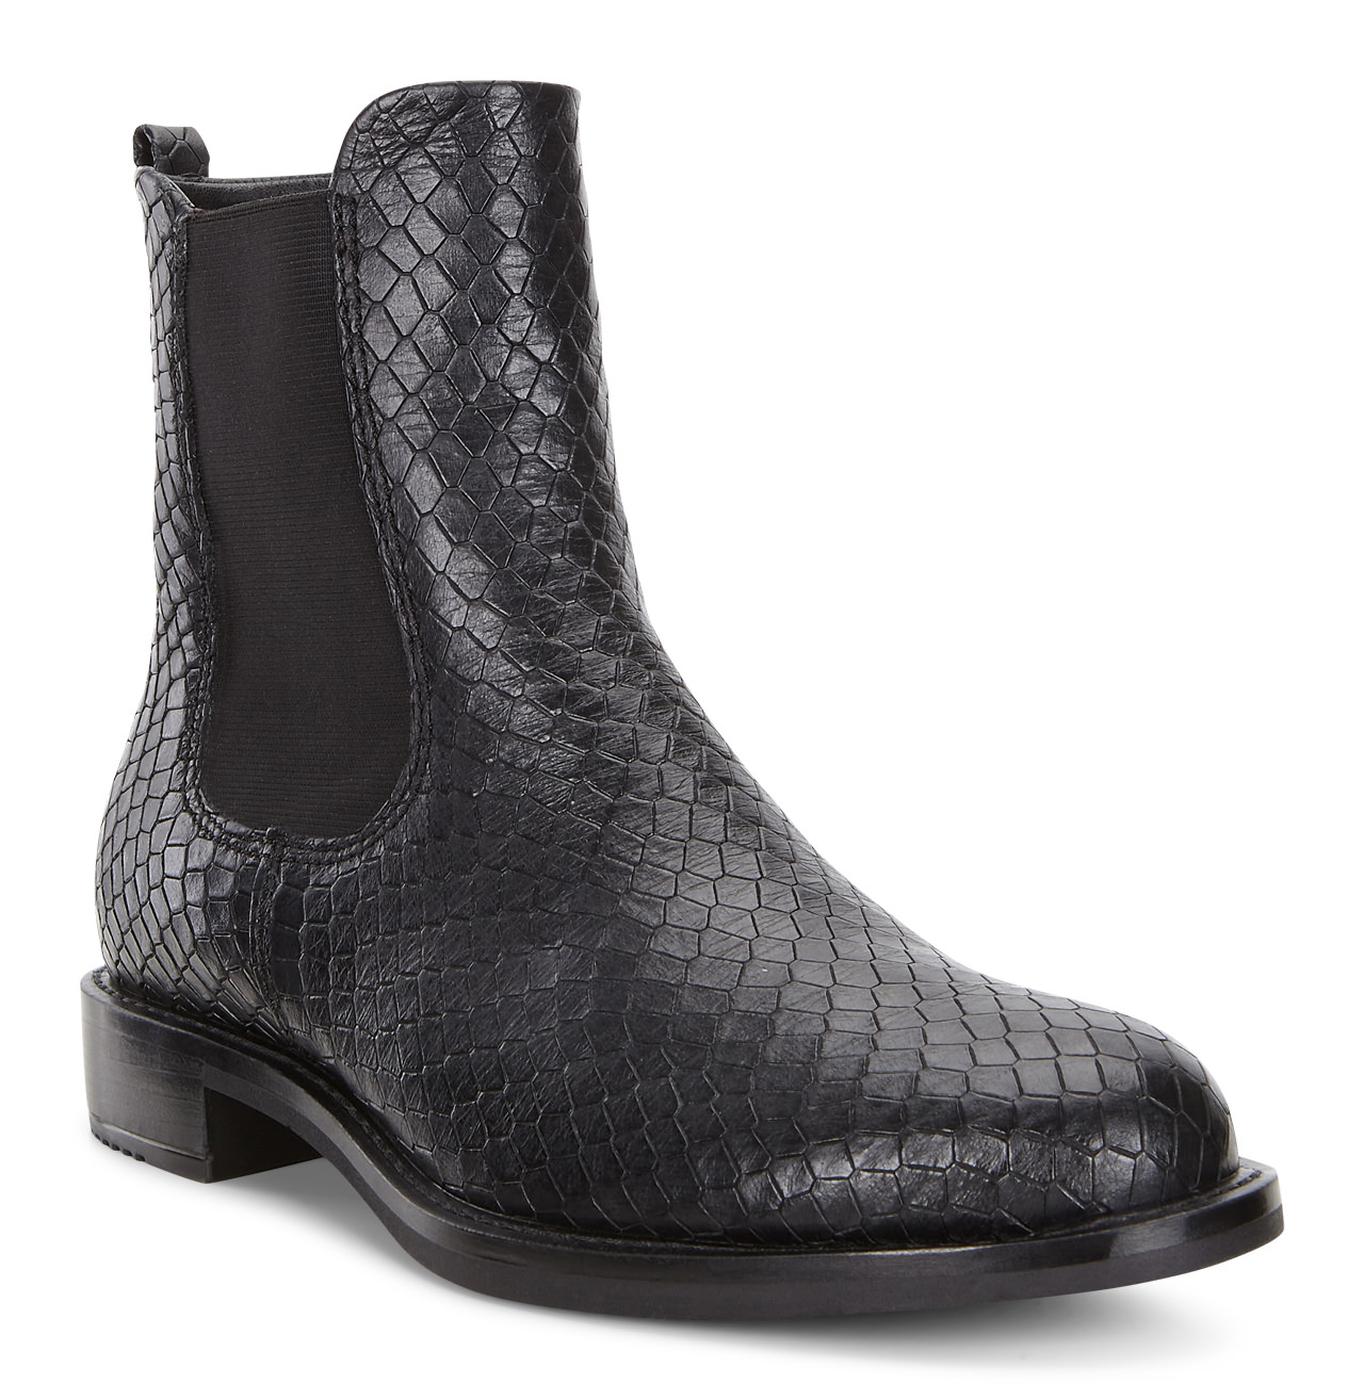 ECCO Sartorelle Womens 25 Ankle Boot